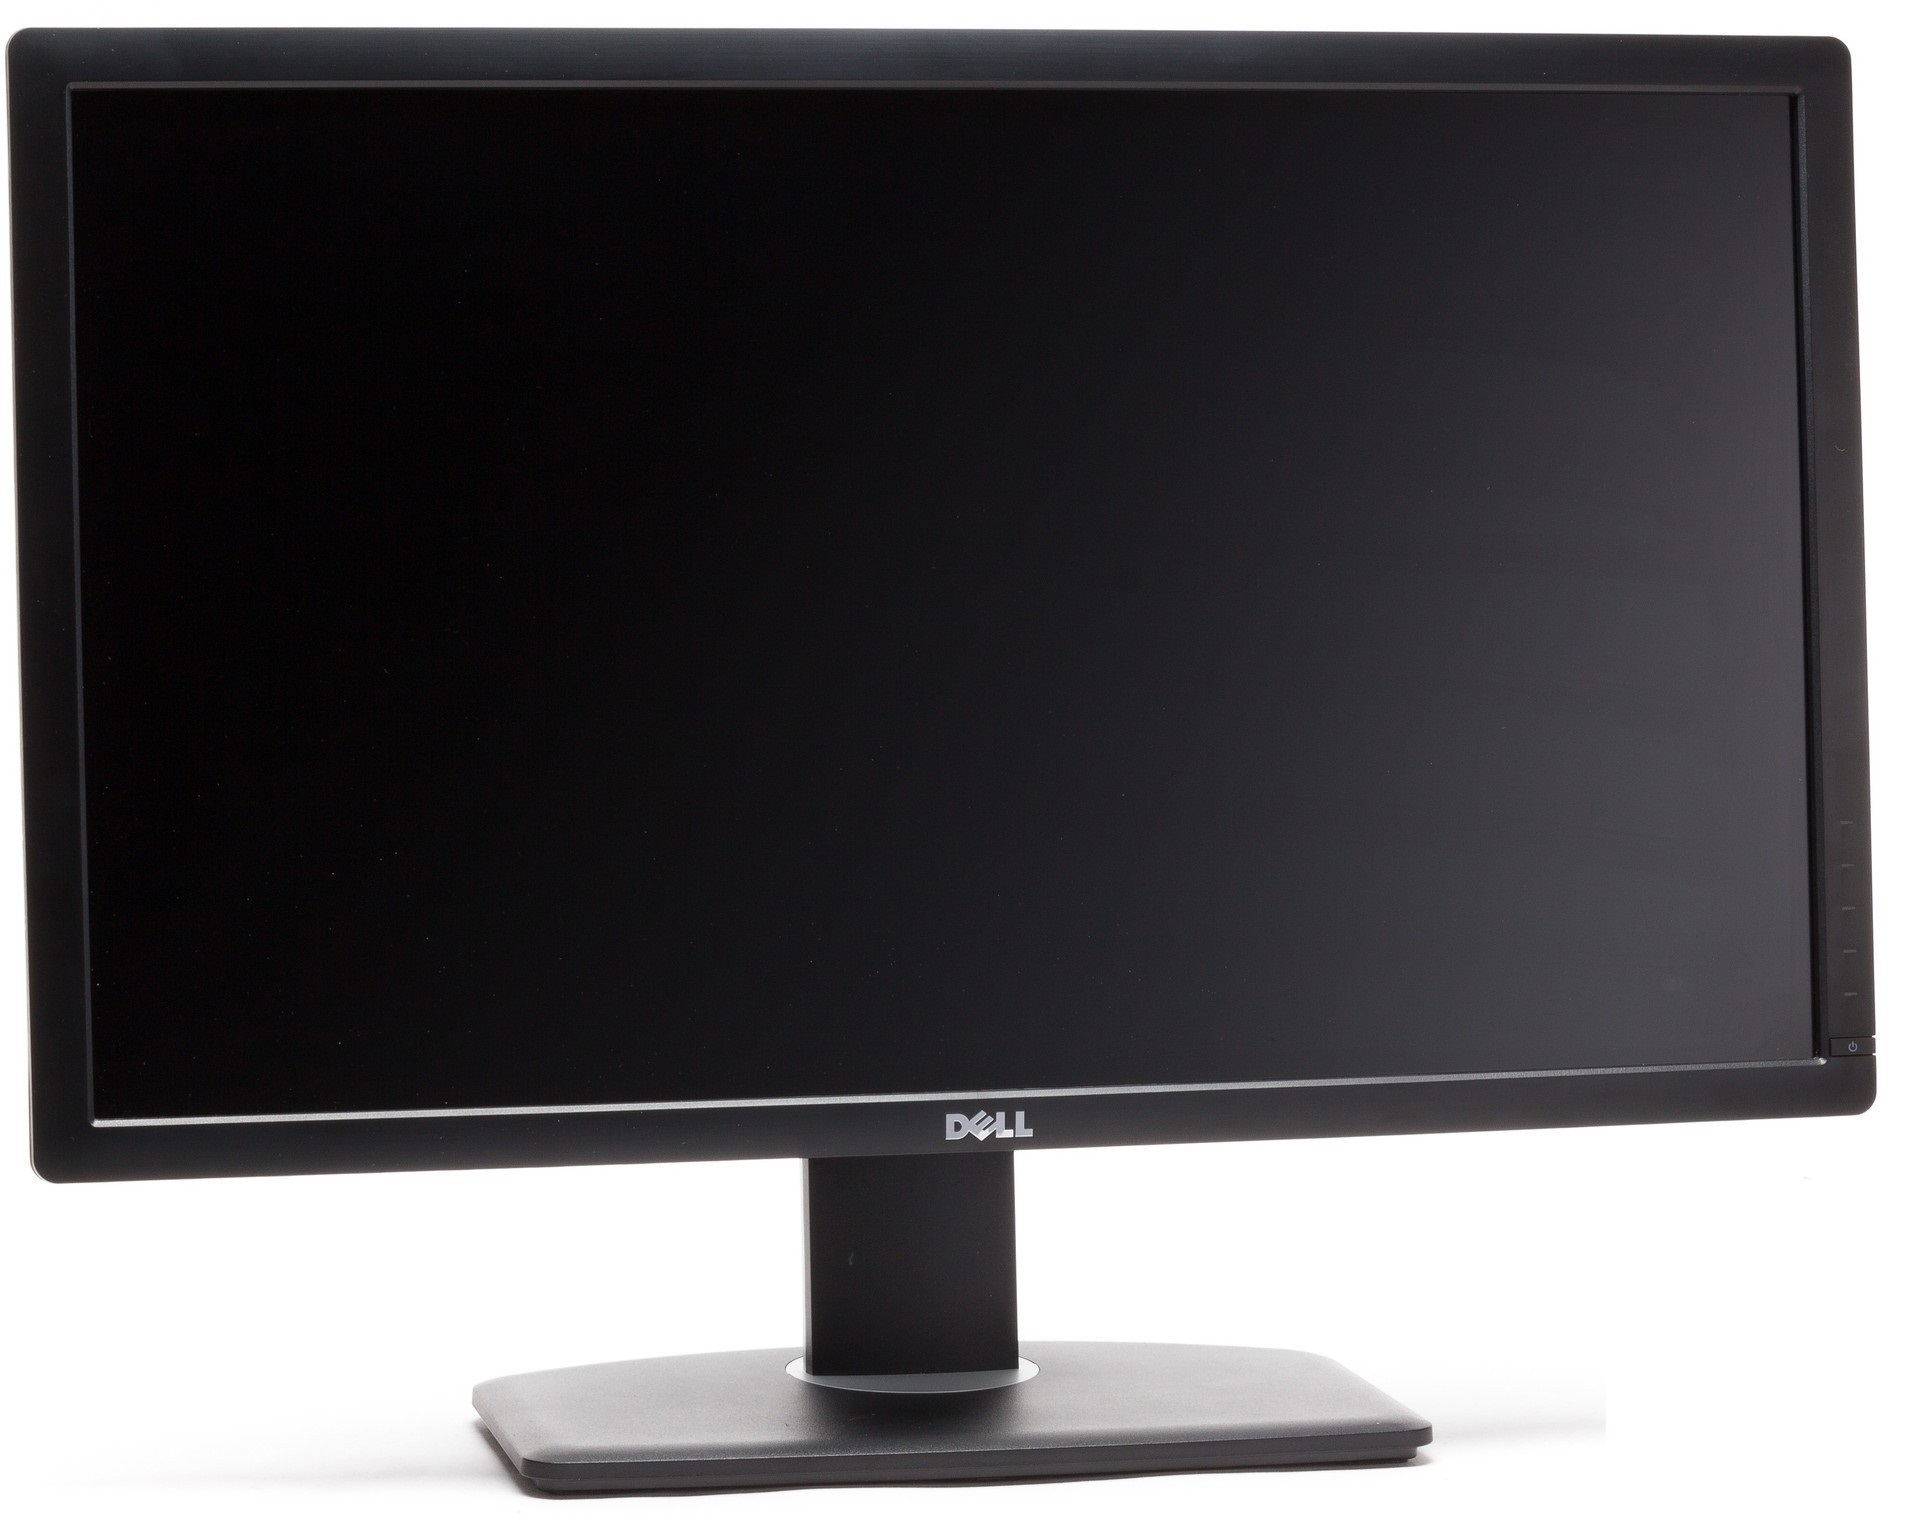 dell u2713h 68 5 cm 27 led monitor dvi 6ms reaktionszeit rechnung ebay. Black Bedroom Furniture Sets. Home Design Ideas